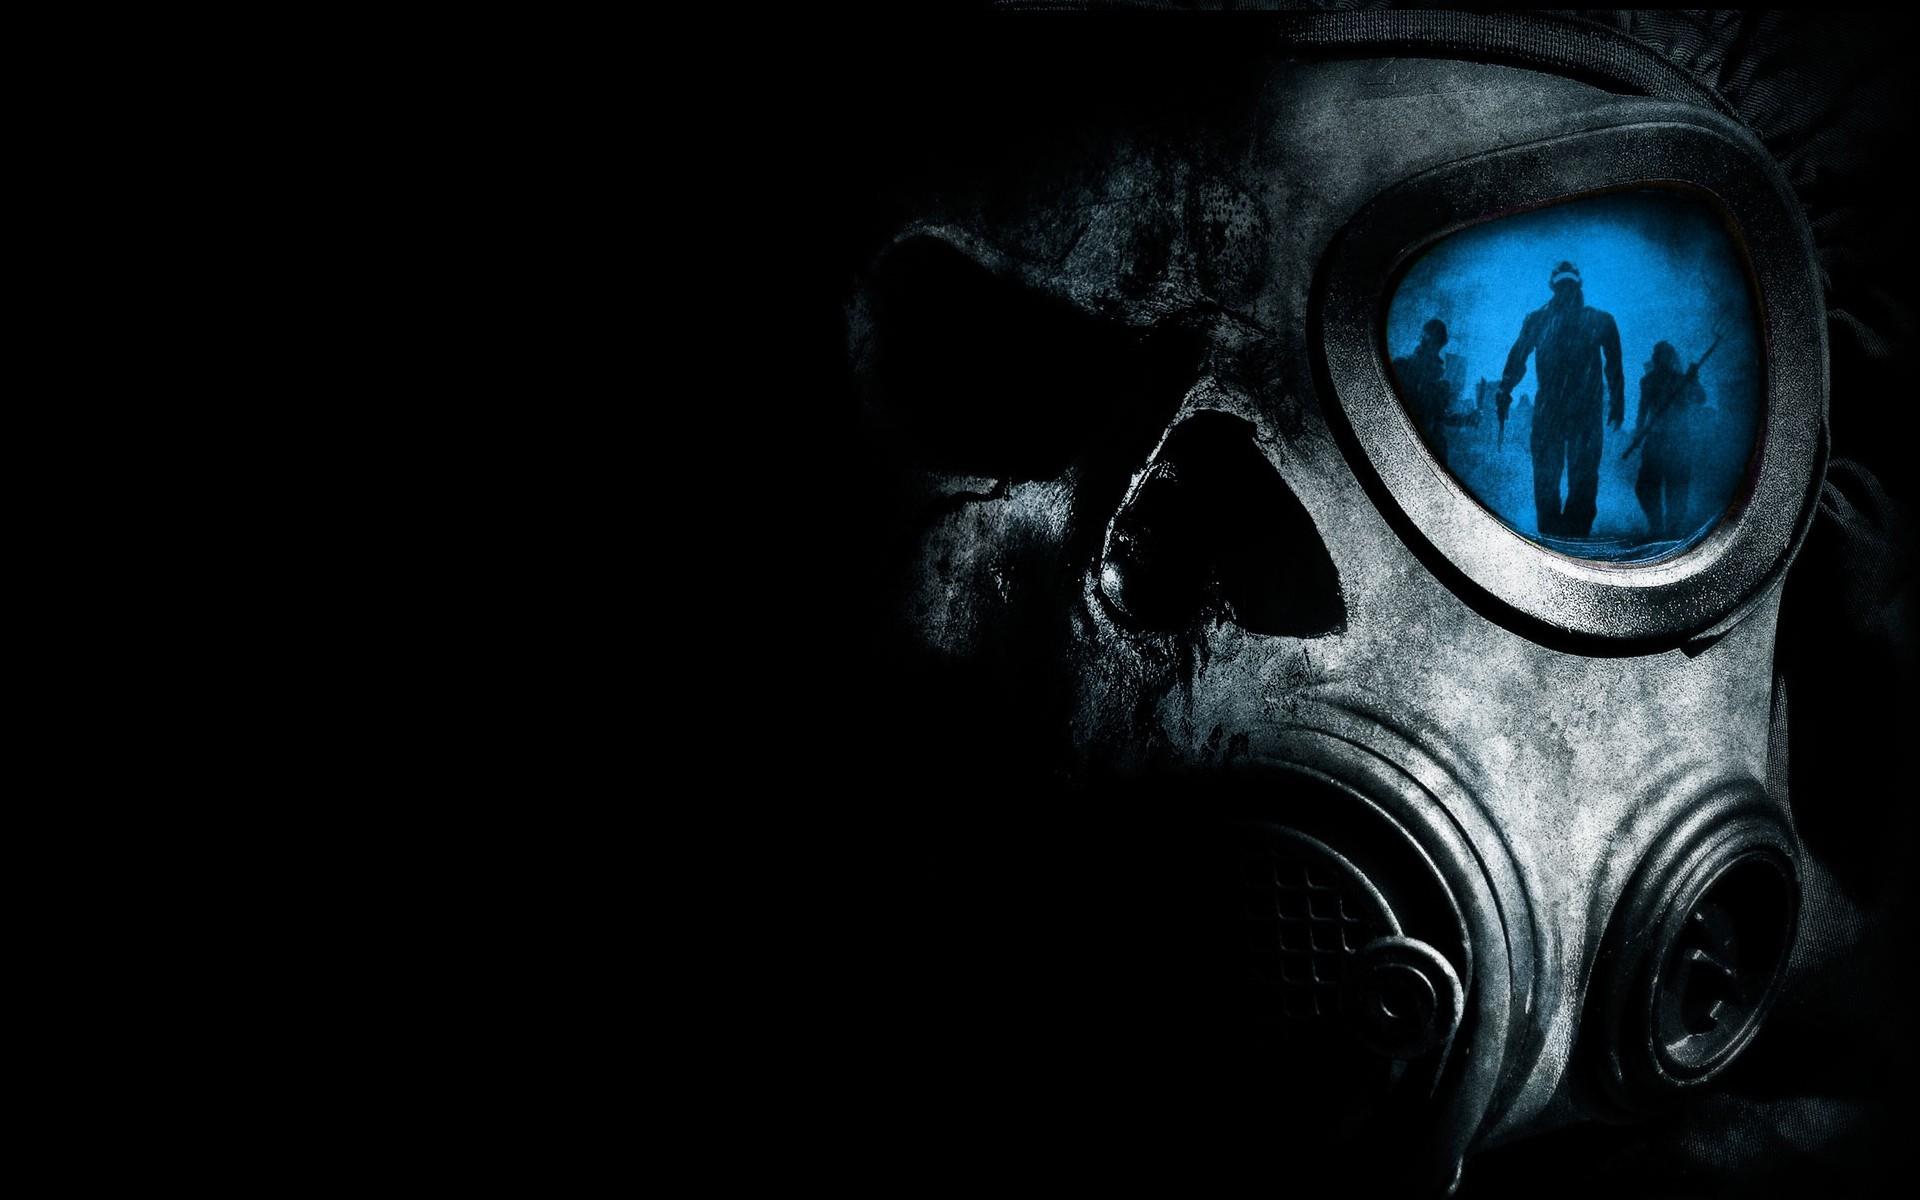 Dishonored 2012 PC game desktop wallpaper